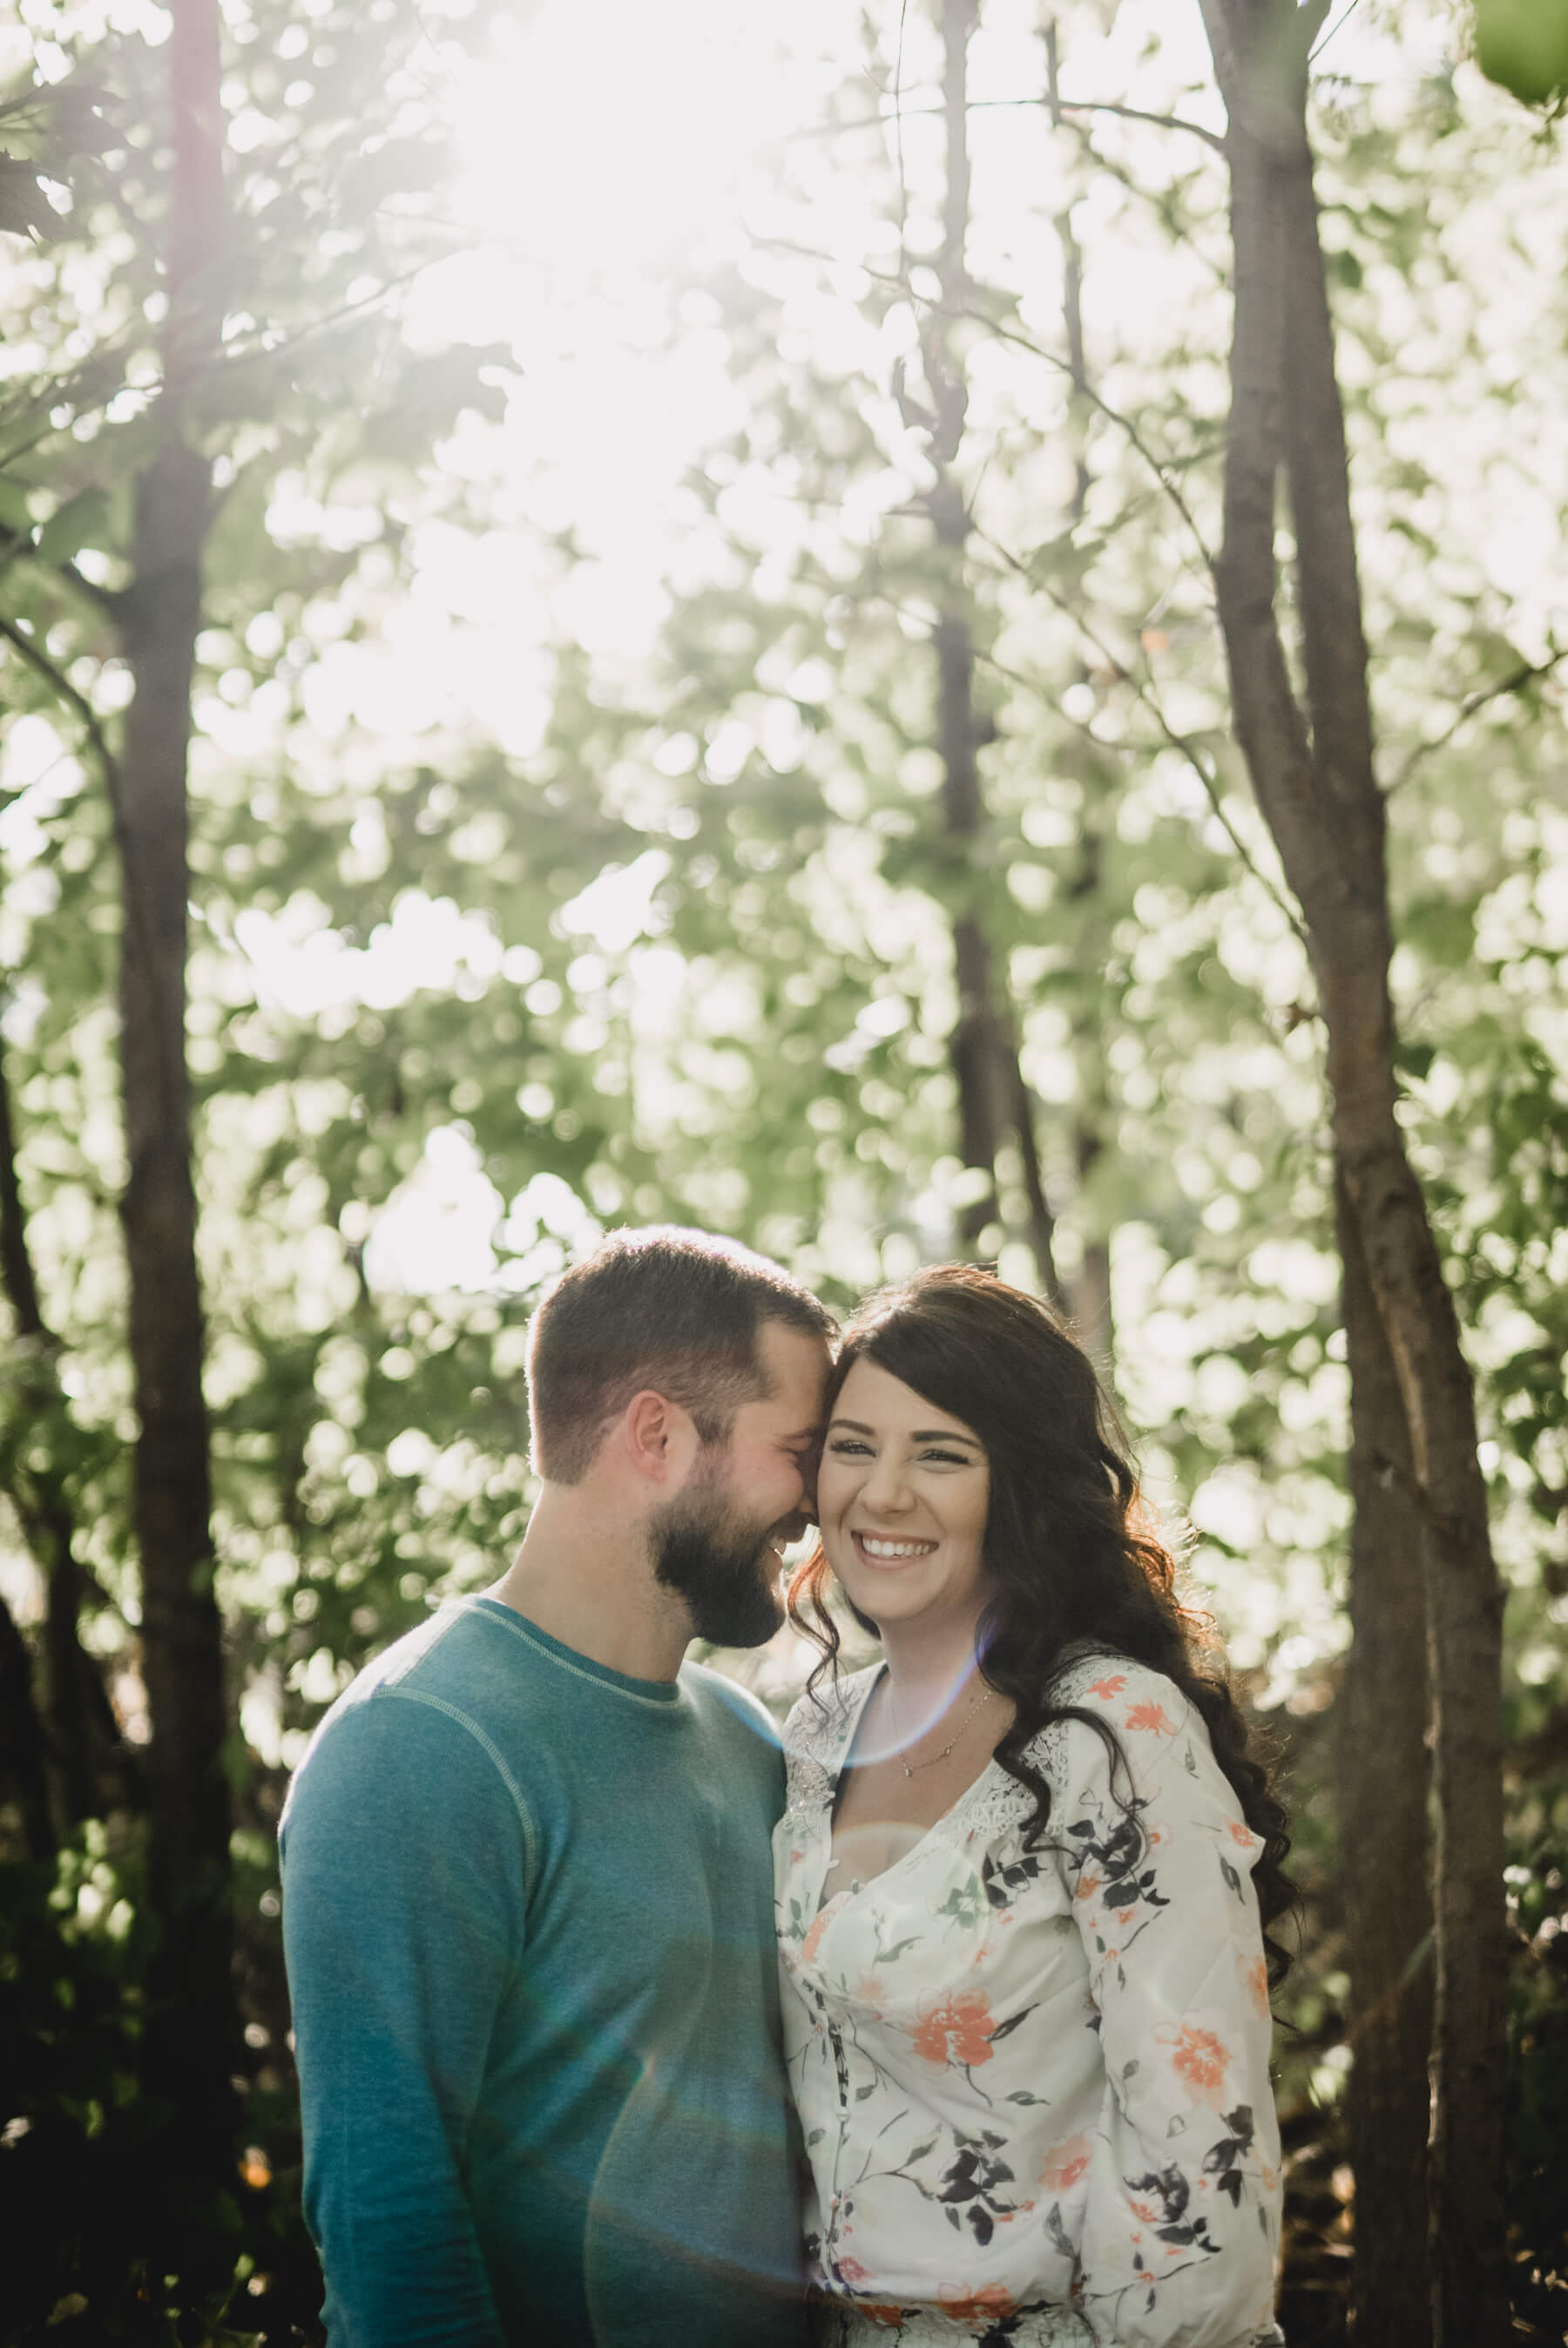 Engle-Olson-Chad-Jen-Engagement-18.jpg